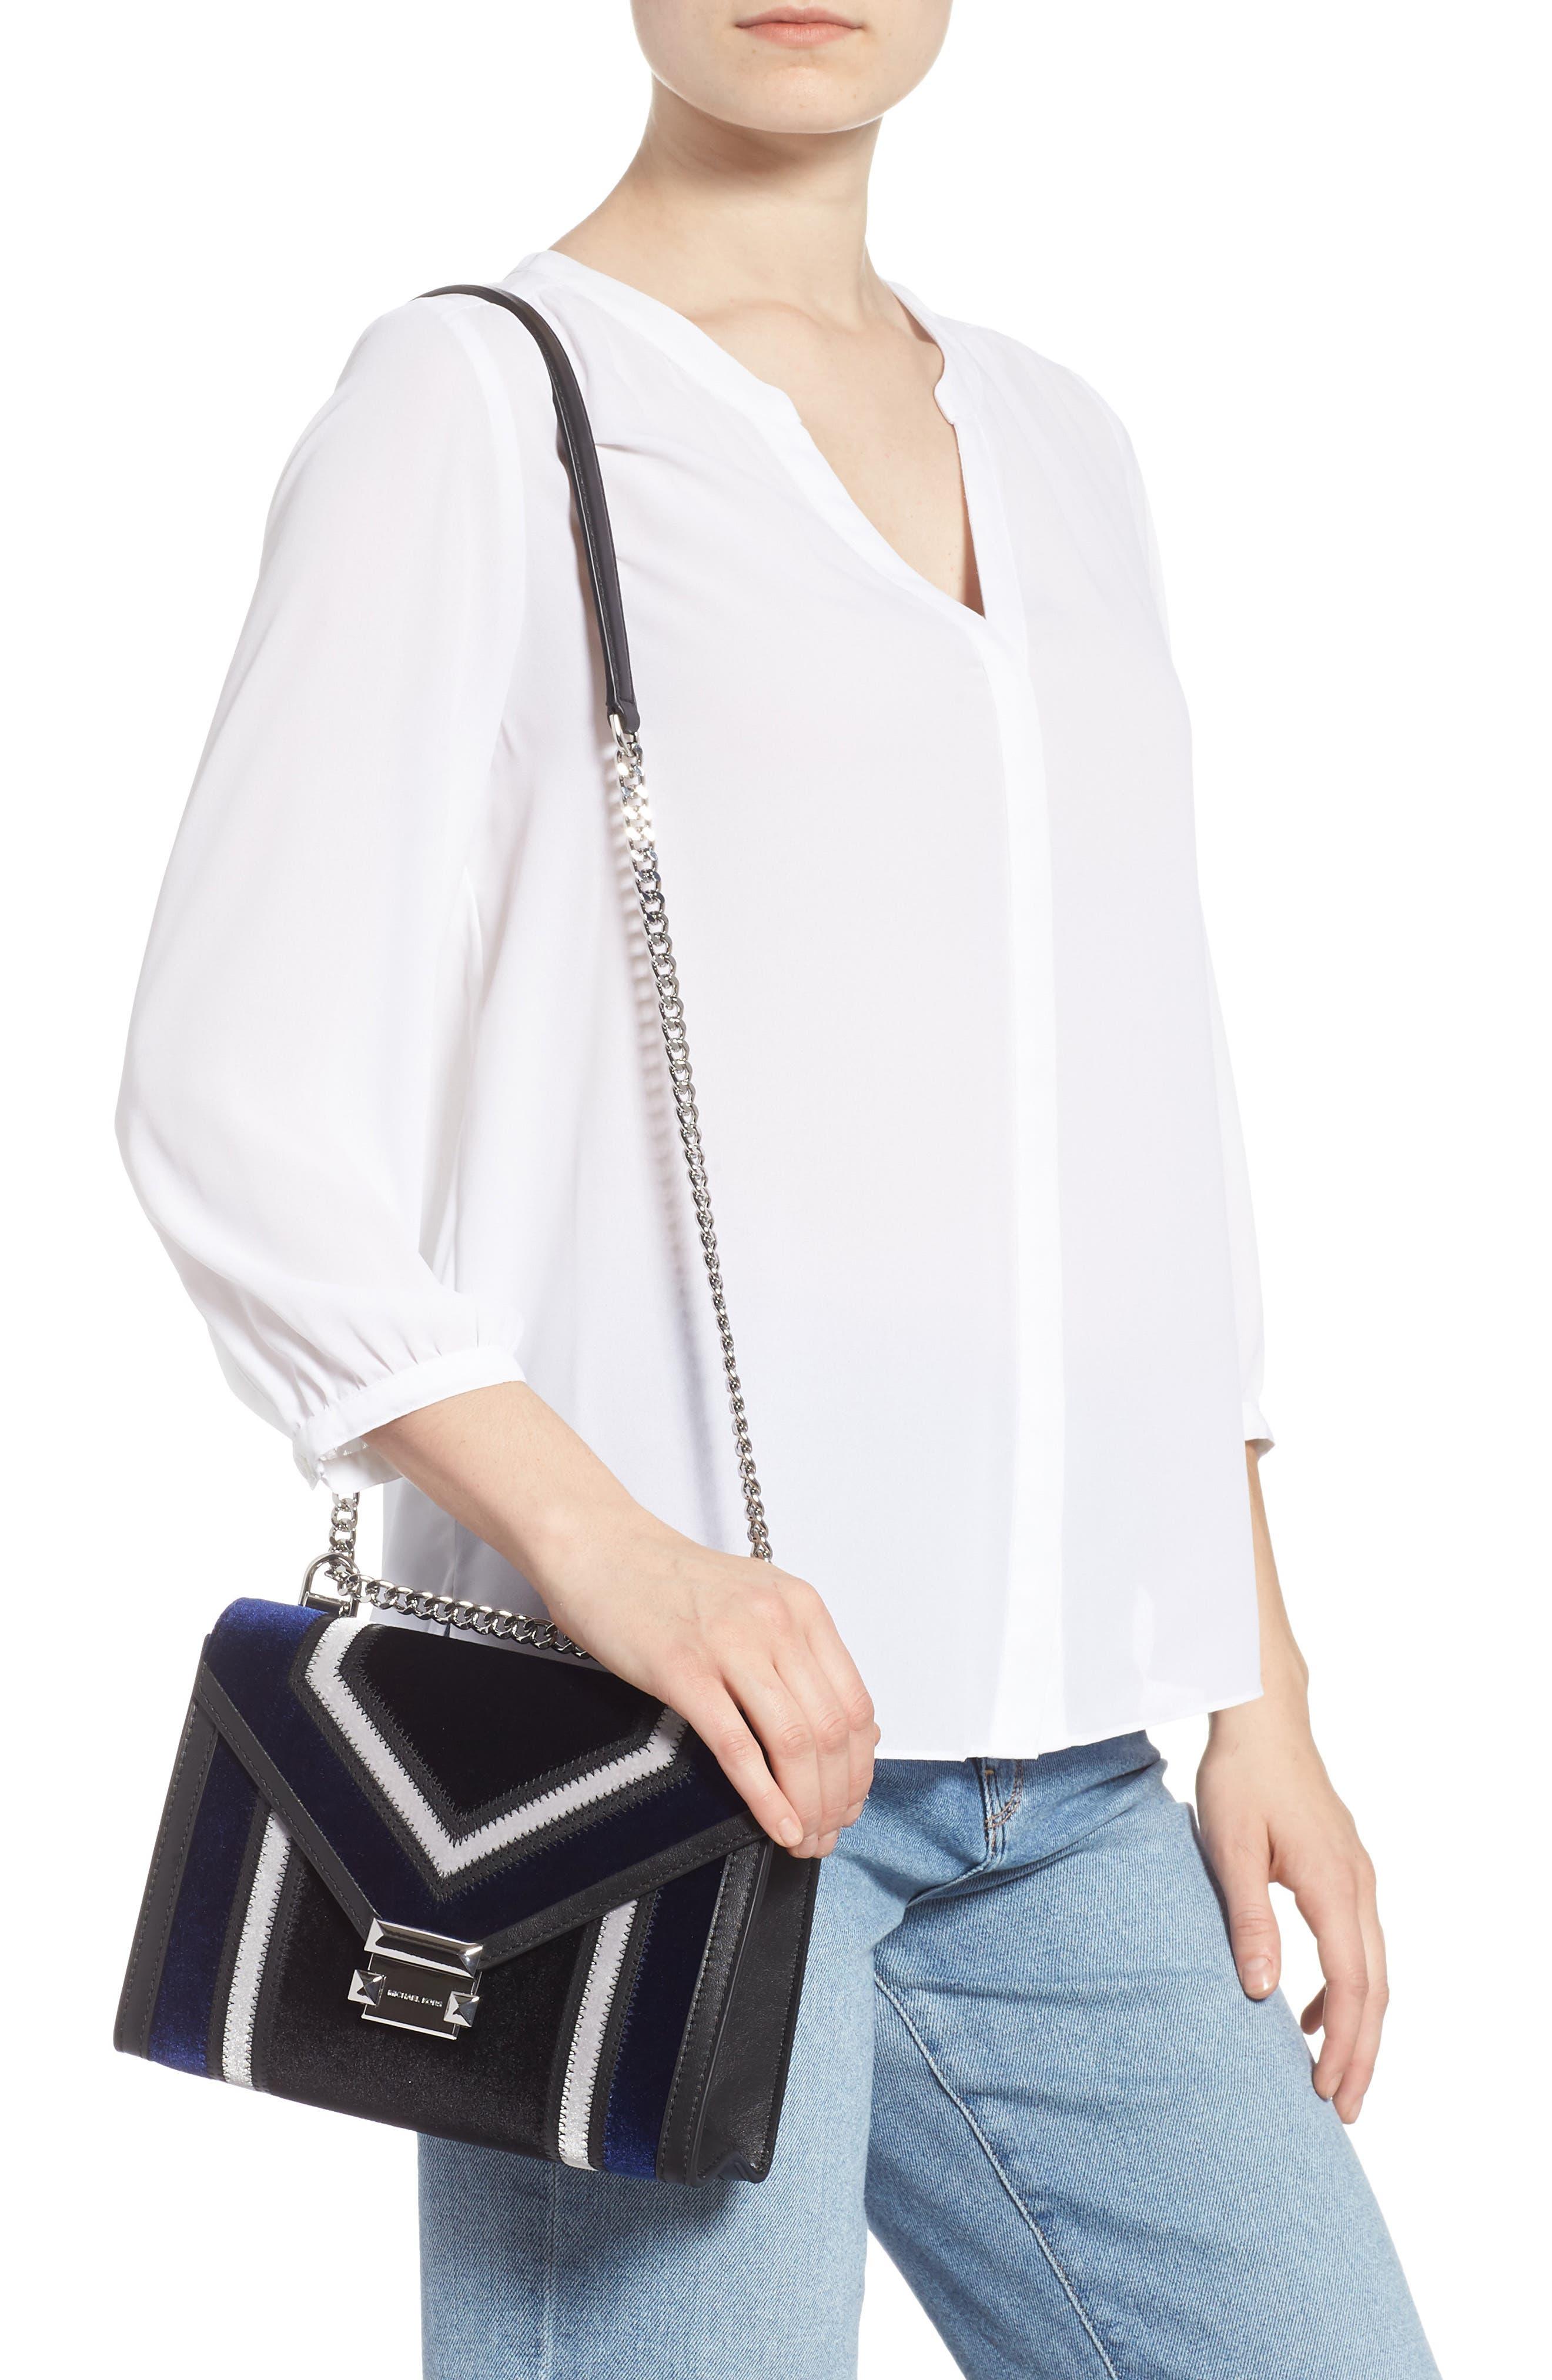 Large Velvet Shoulder Bag,                             Alternate thumbnail 2, color,                             BLACK/ DARK BLUE